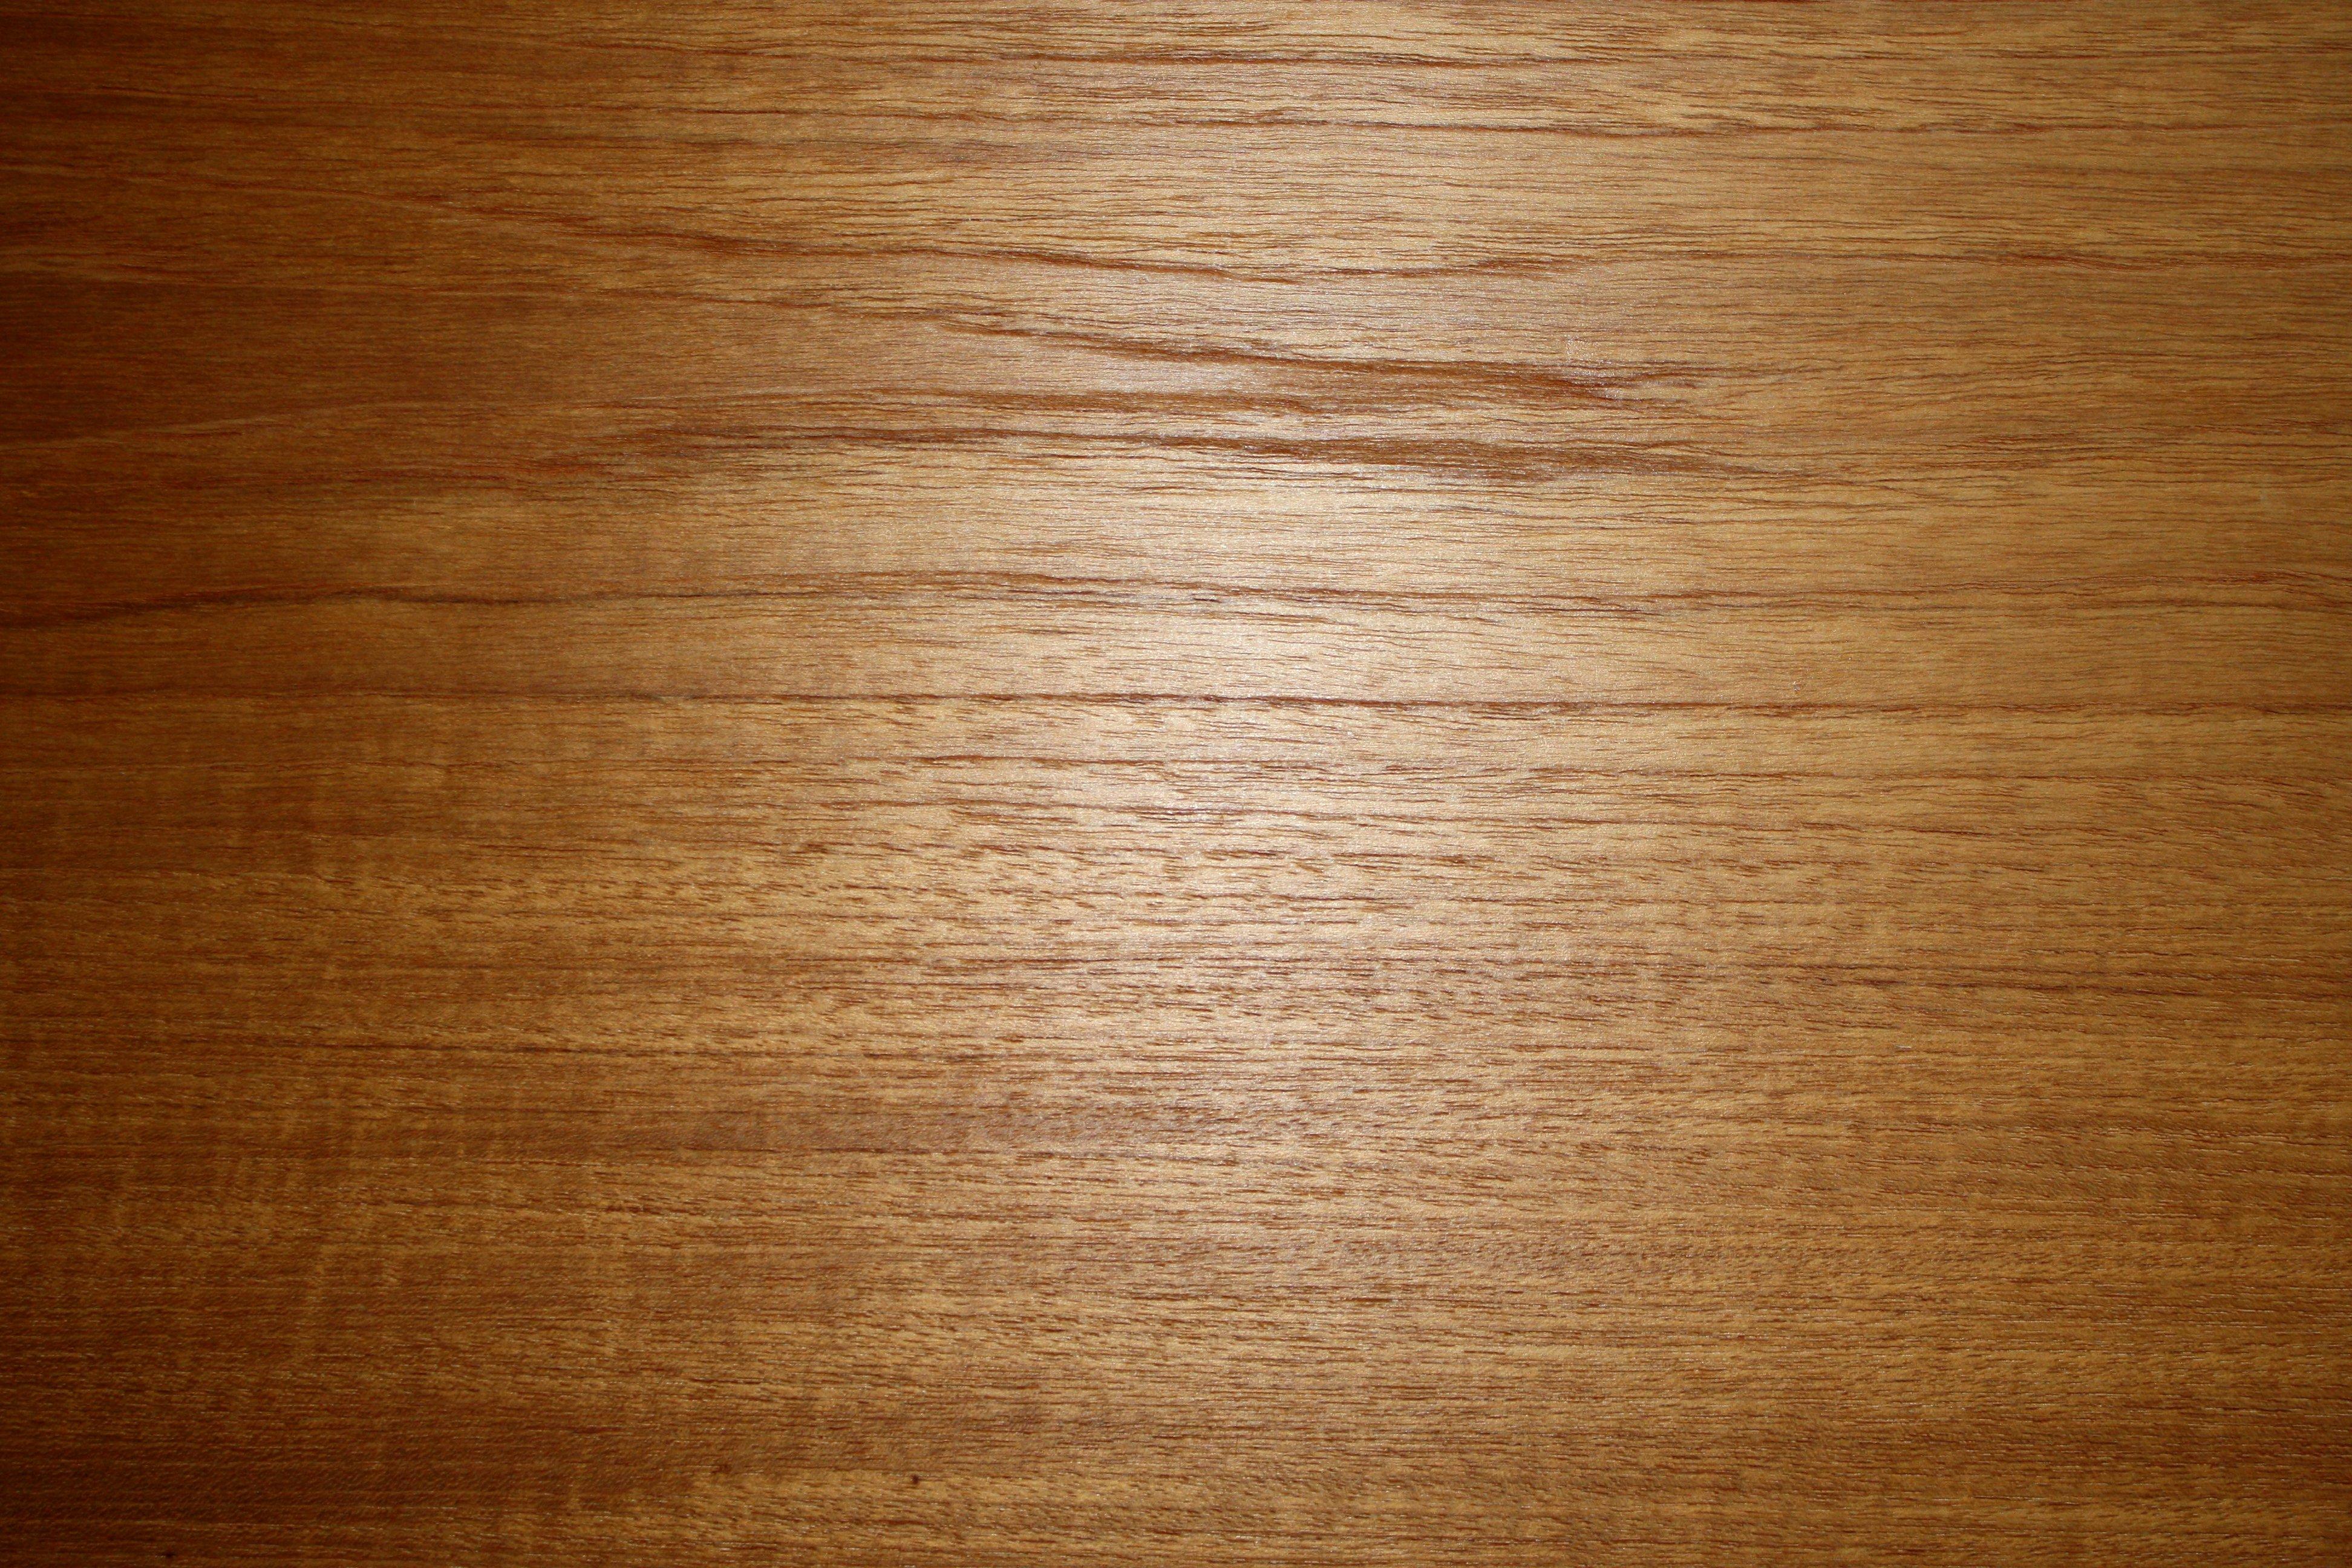 Wood Grain Texture High Resolution Photo Dimensions 3888 3888x2592